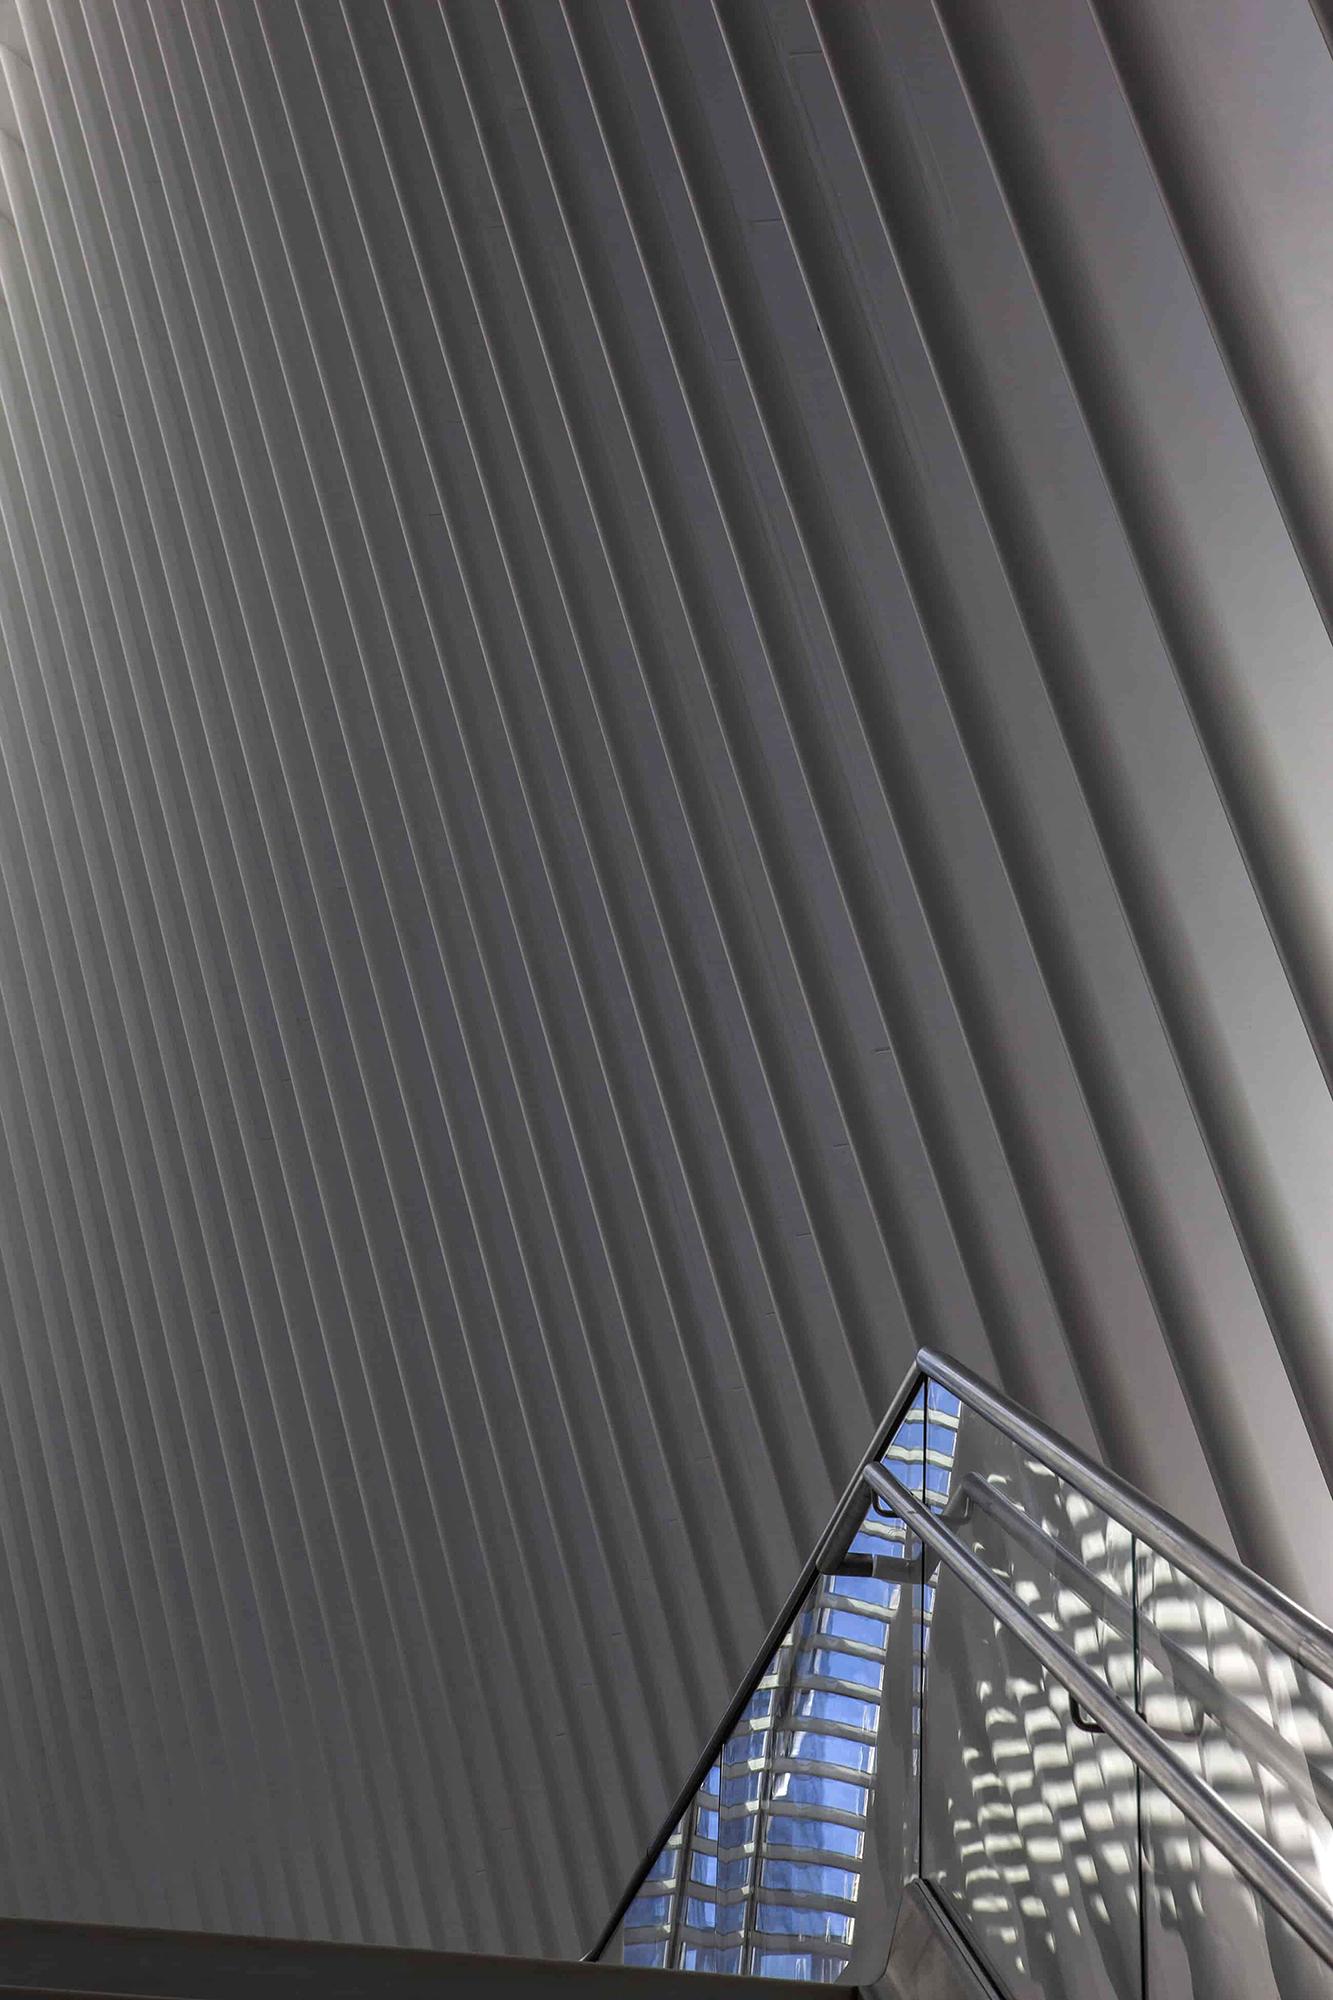 Cortlandt Street Station architecture Santiago Calatrava